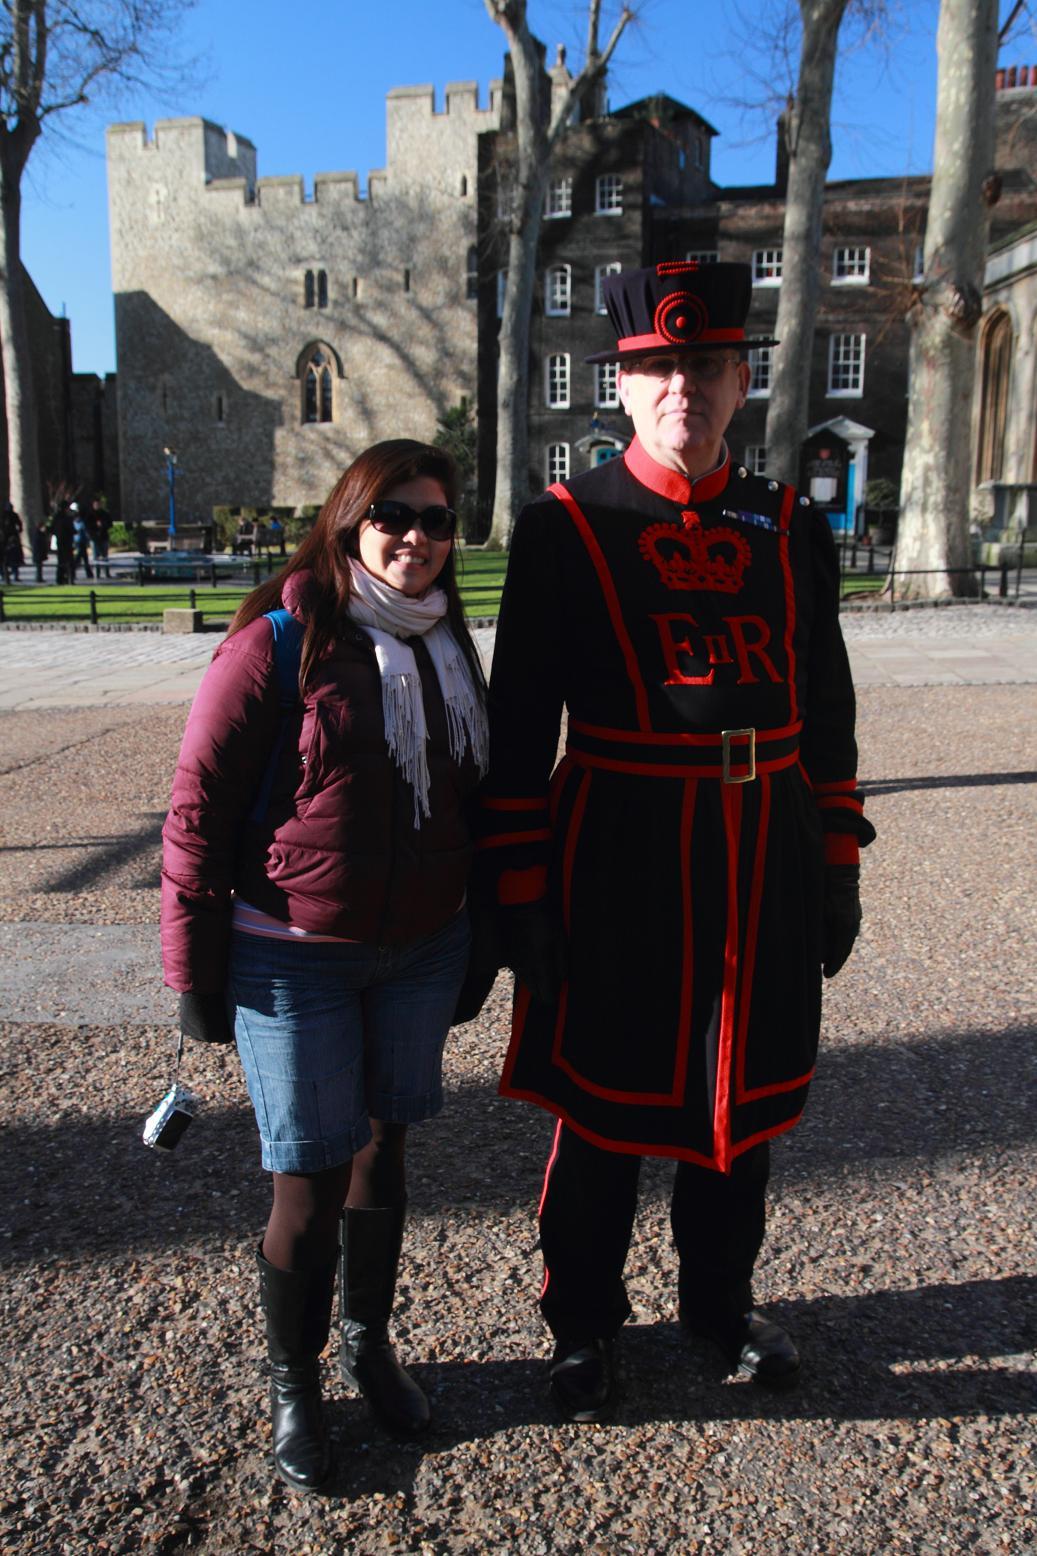 Yeoman Warder o Beefeater en la Torre de Londres